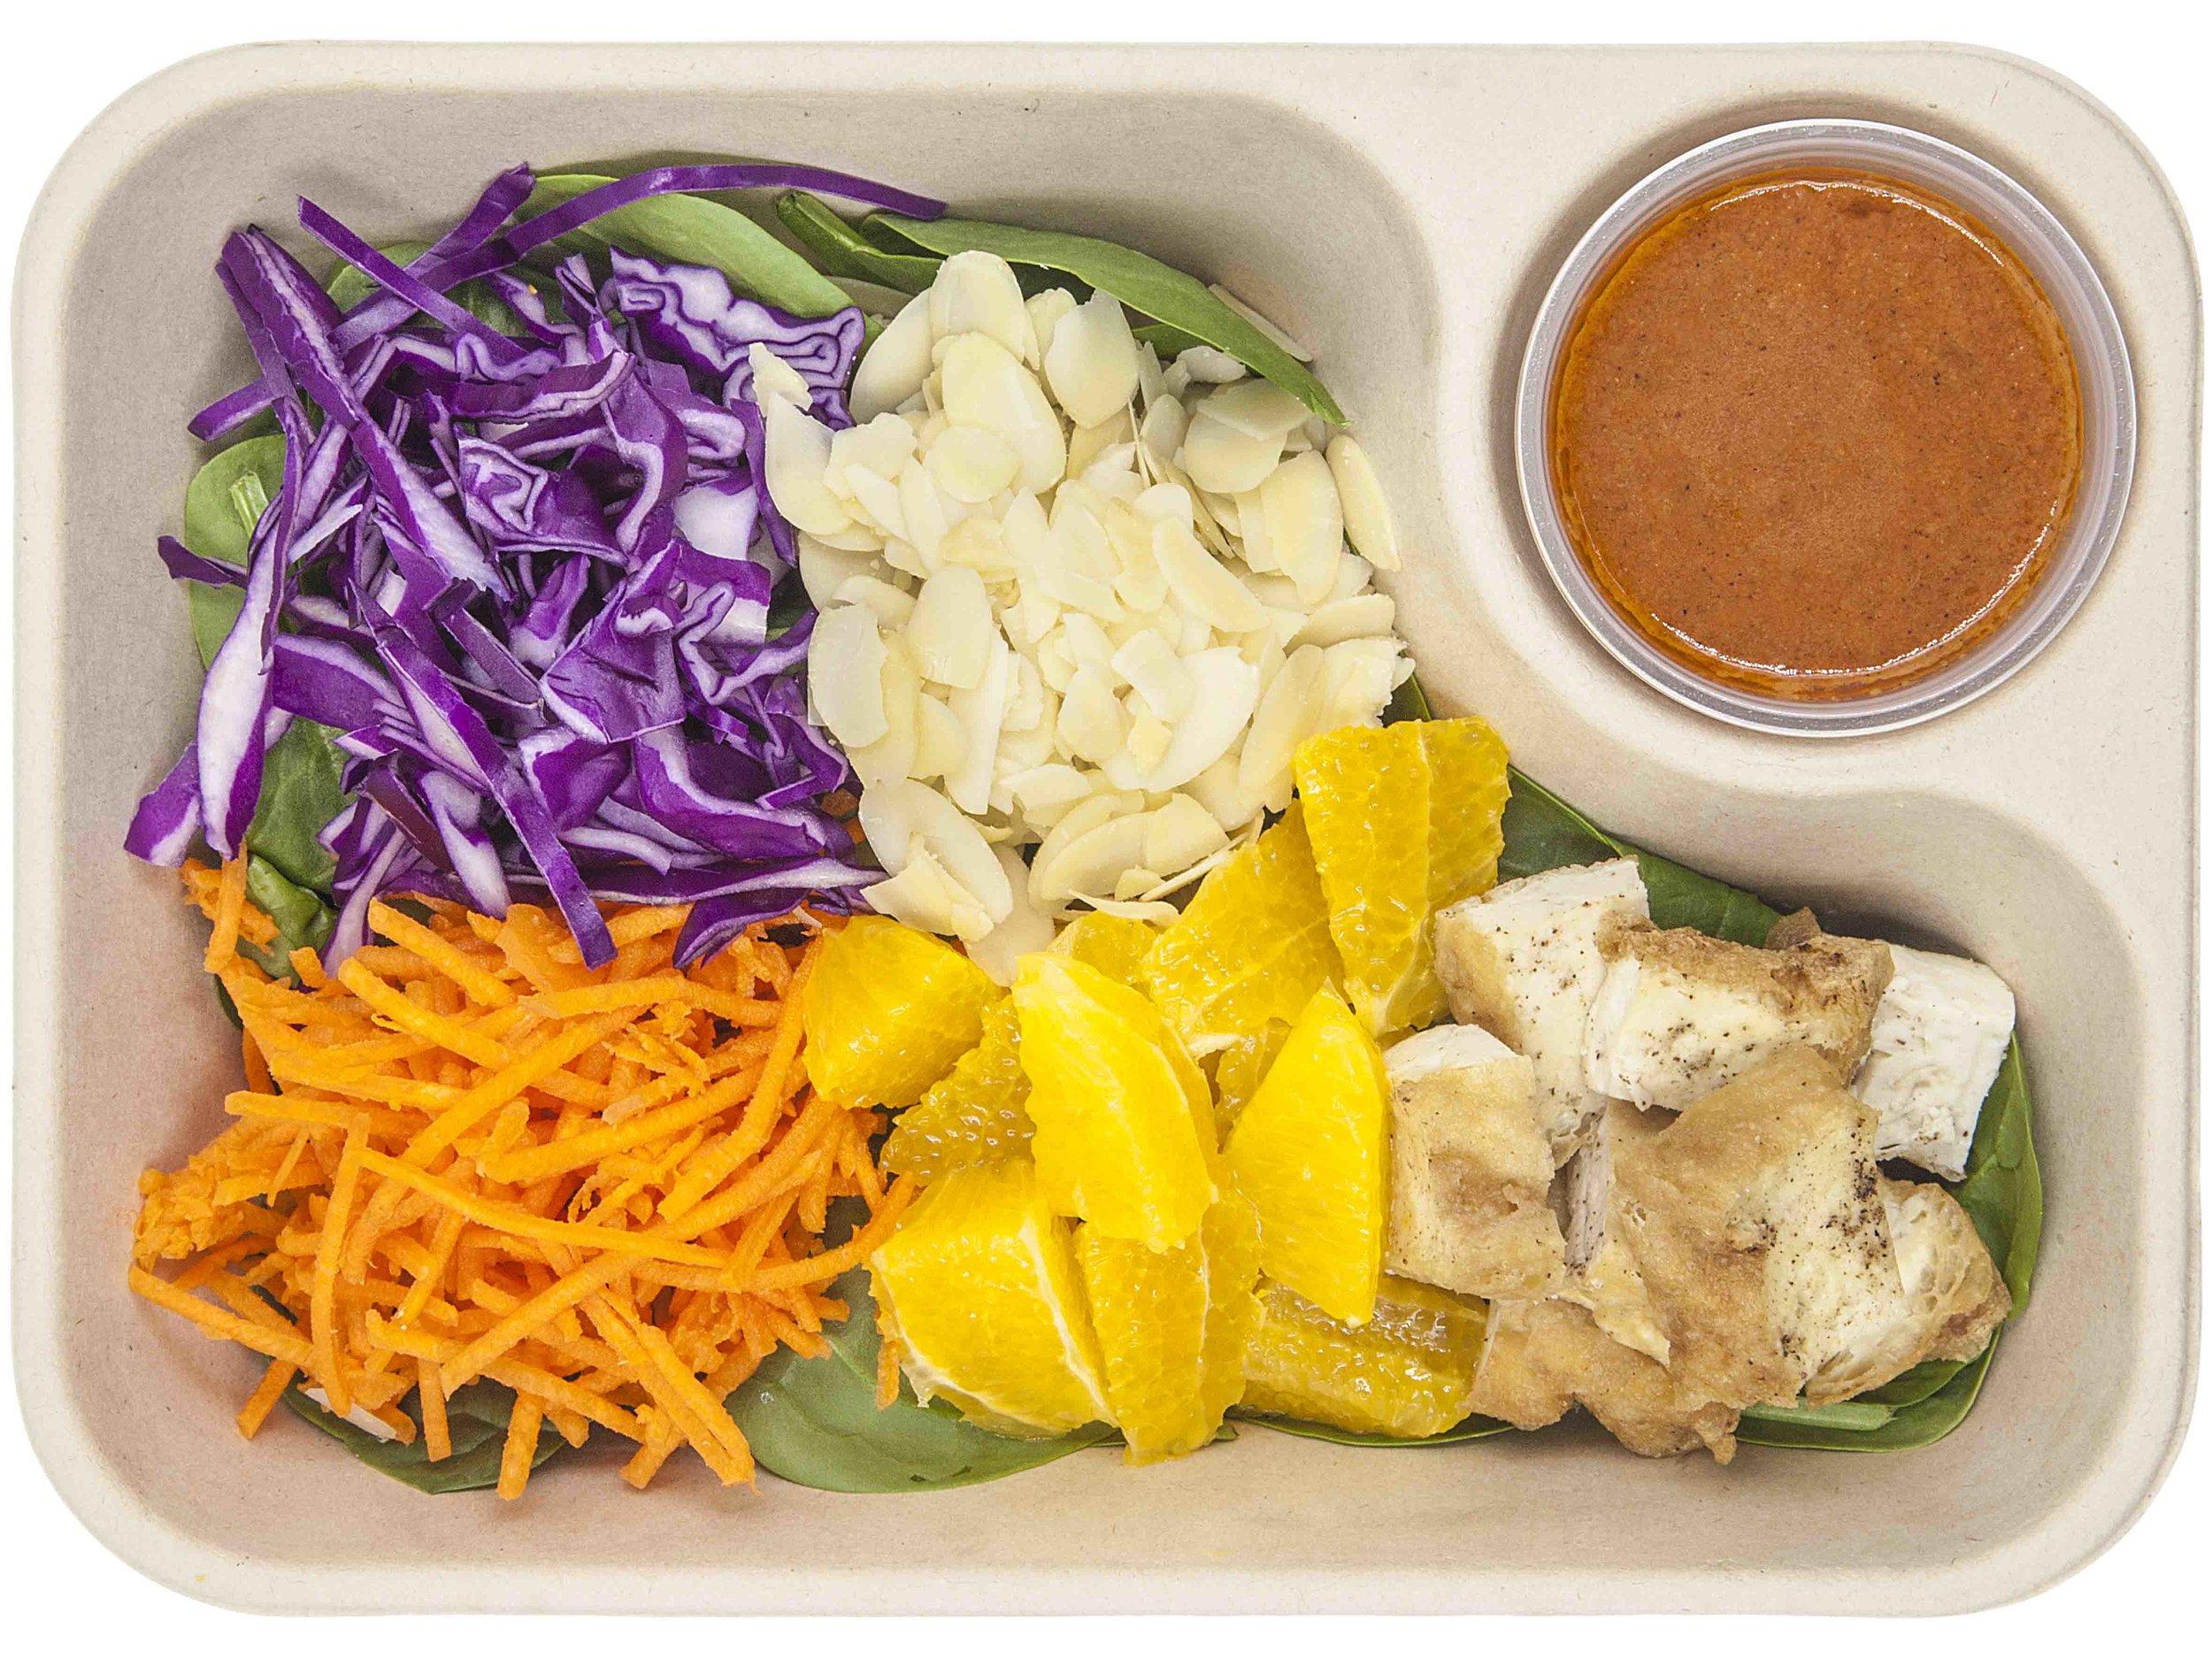 TOFU HANA383 KCAL PER SERVINGINGREDIENTS: Red Cabbage, carrot (strips), Corriander, Shallots, orange chunks, almond,teriyaki glazed tofu, spring onion -